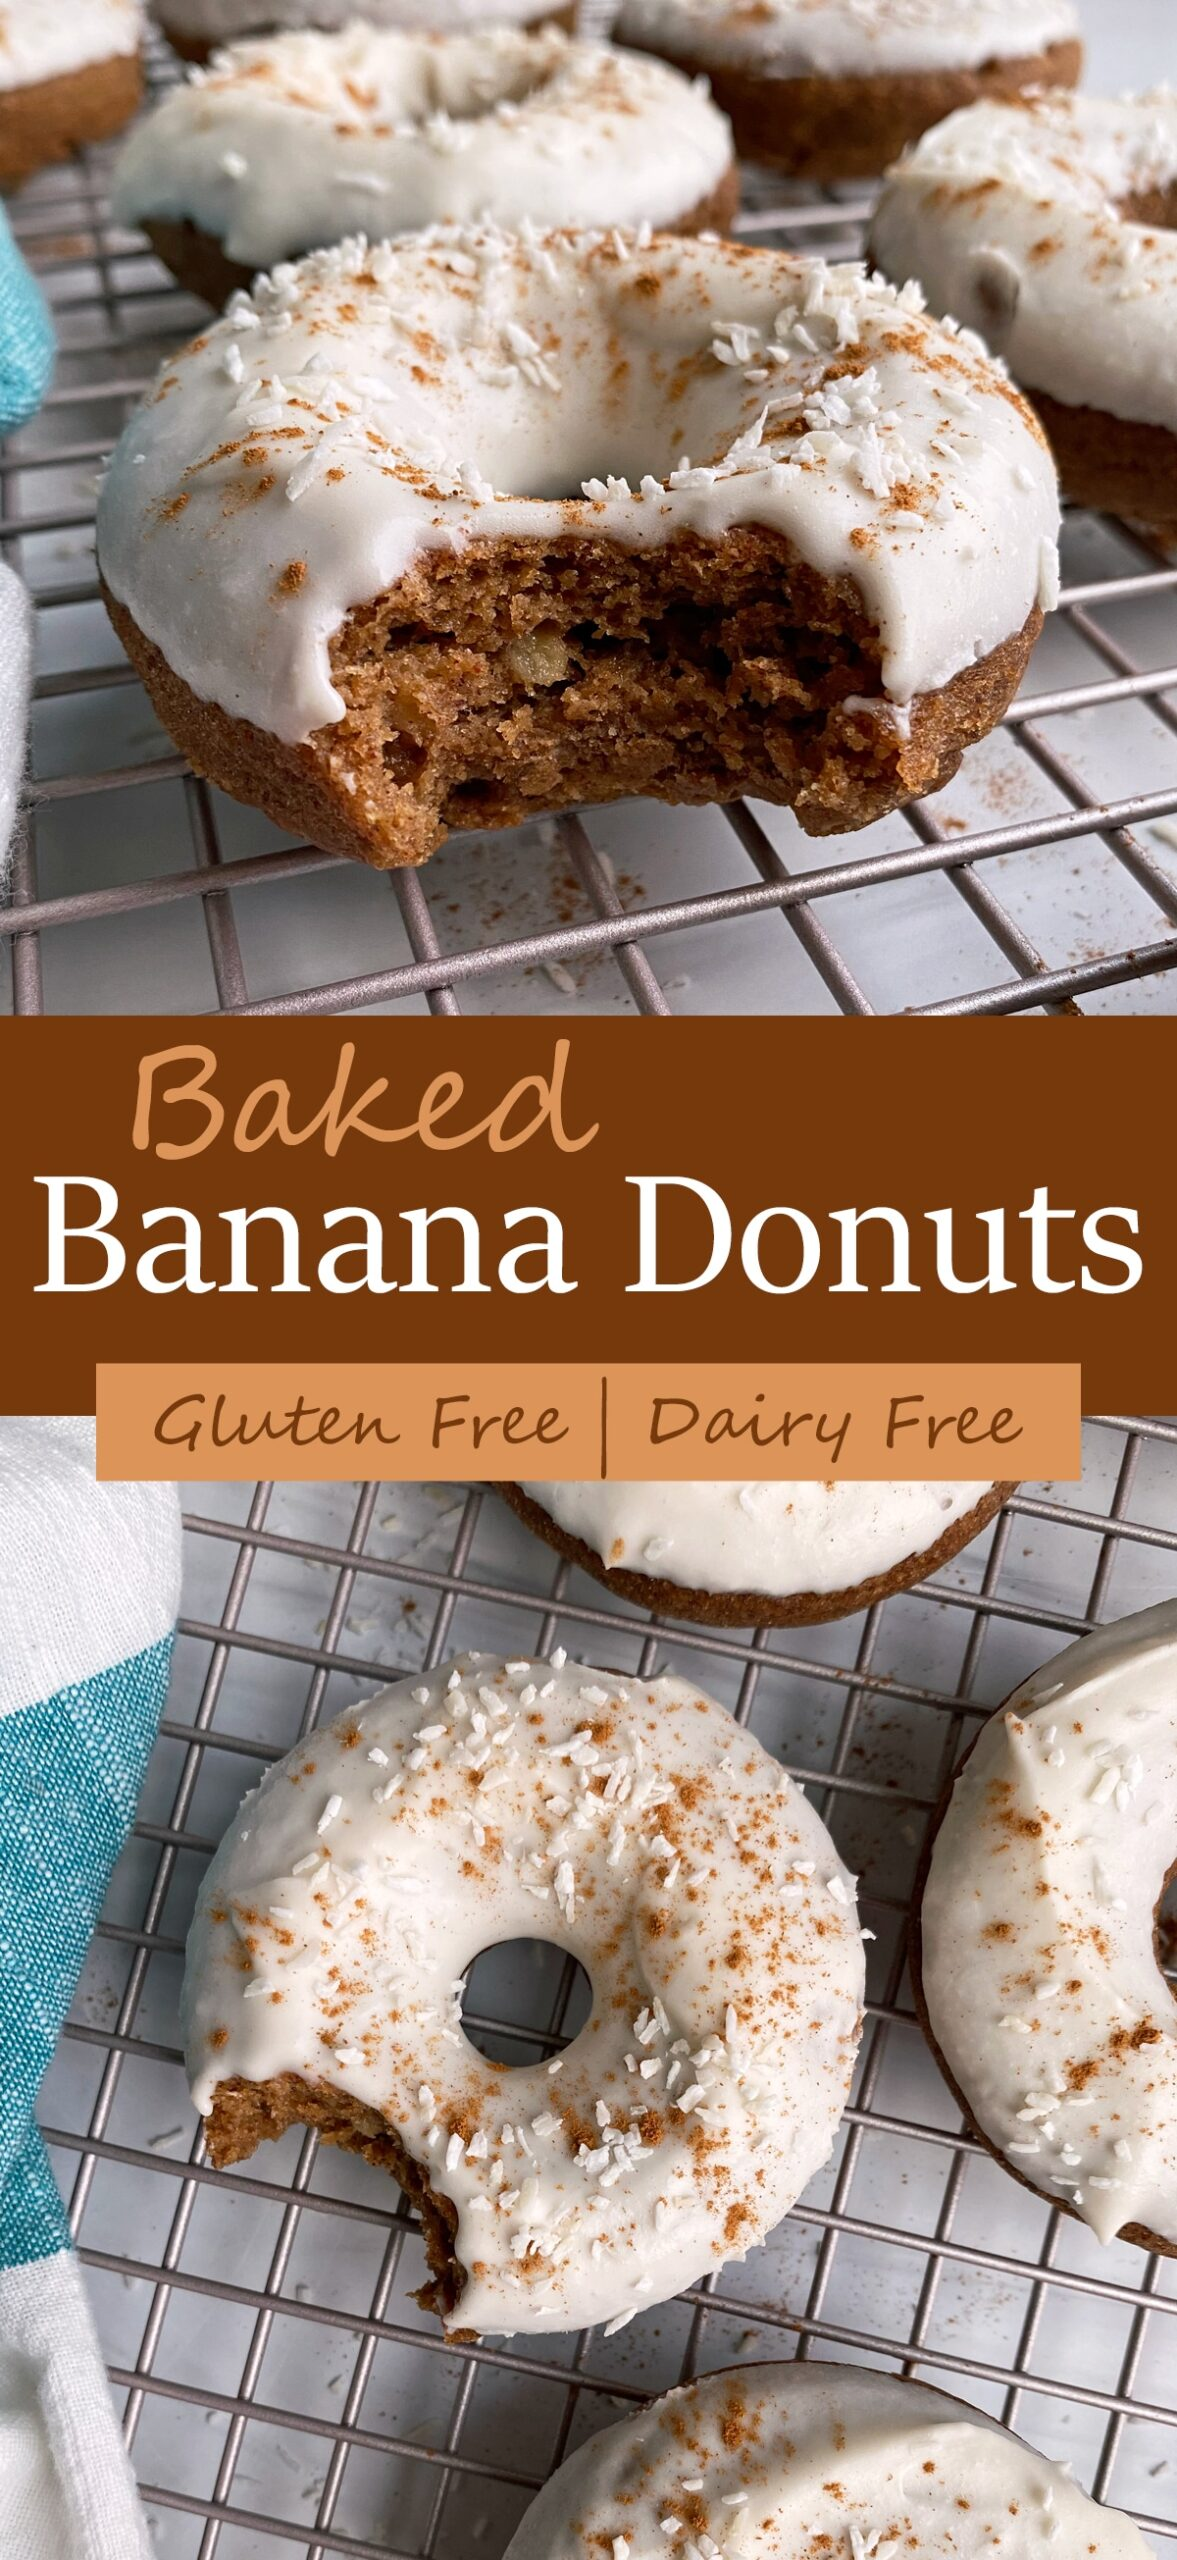 baked-banana-donuts-recipe-pinterest-image